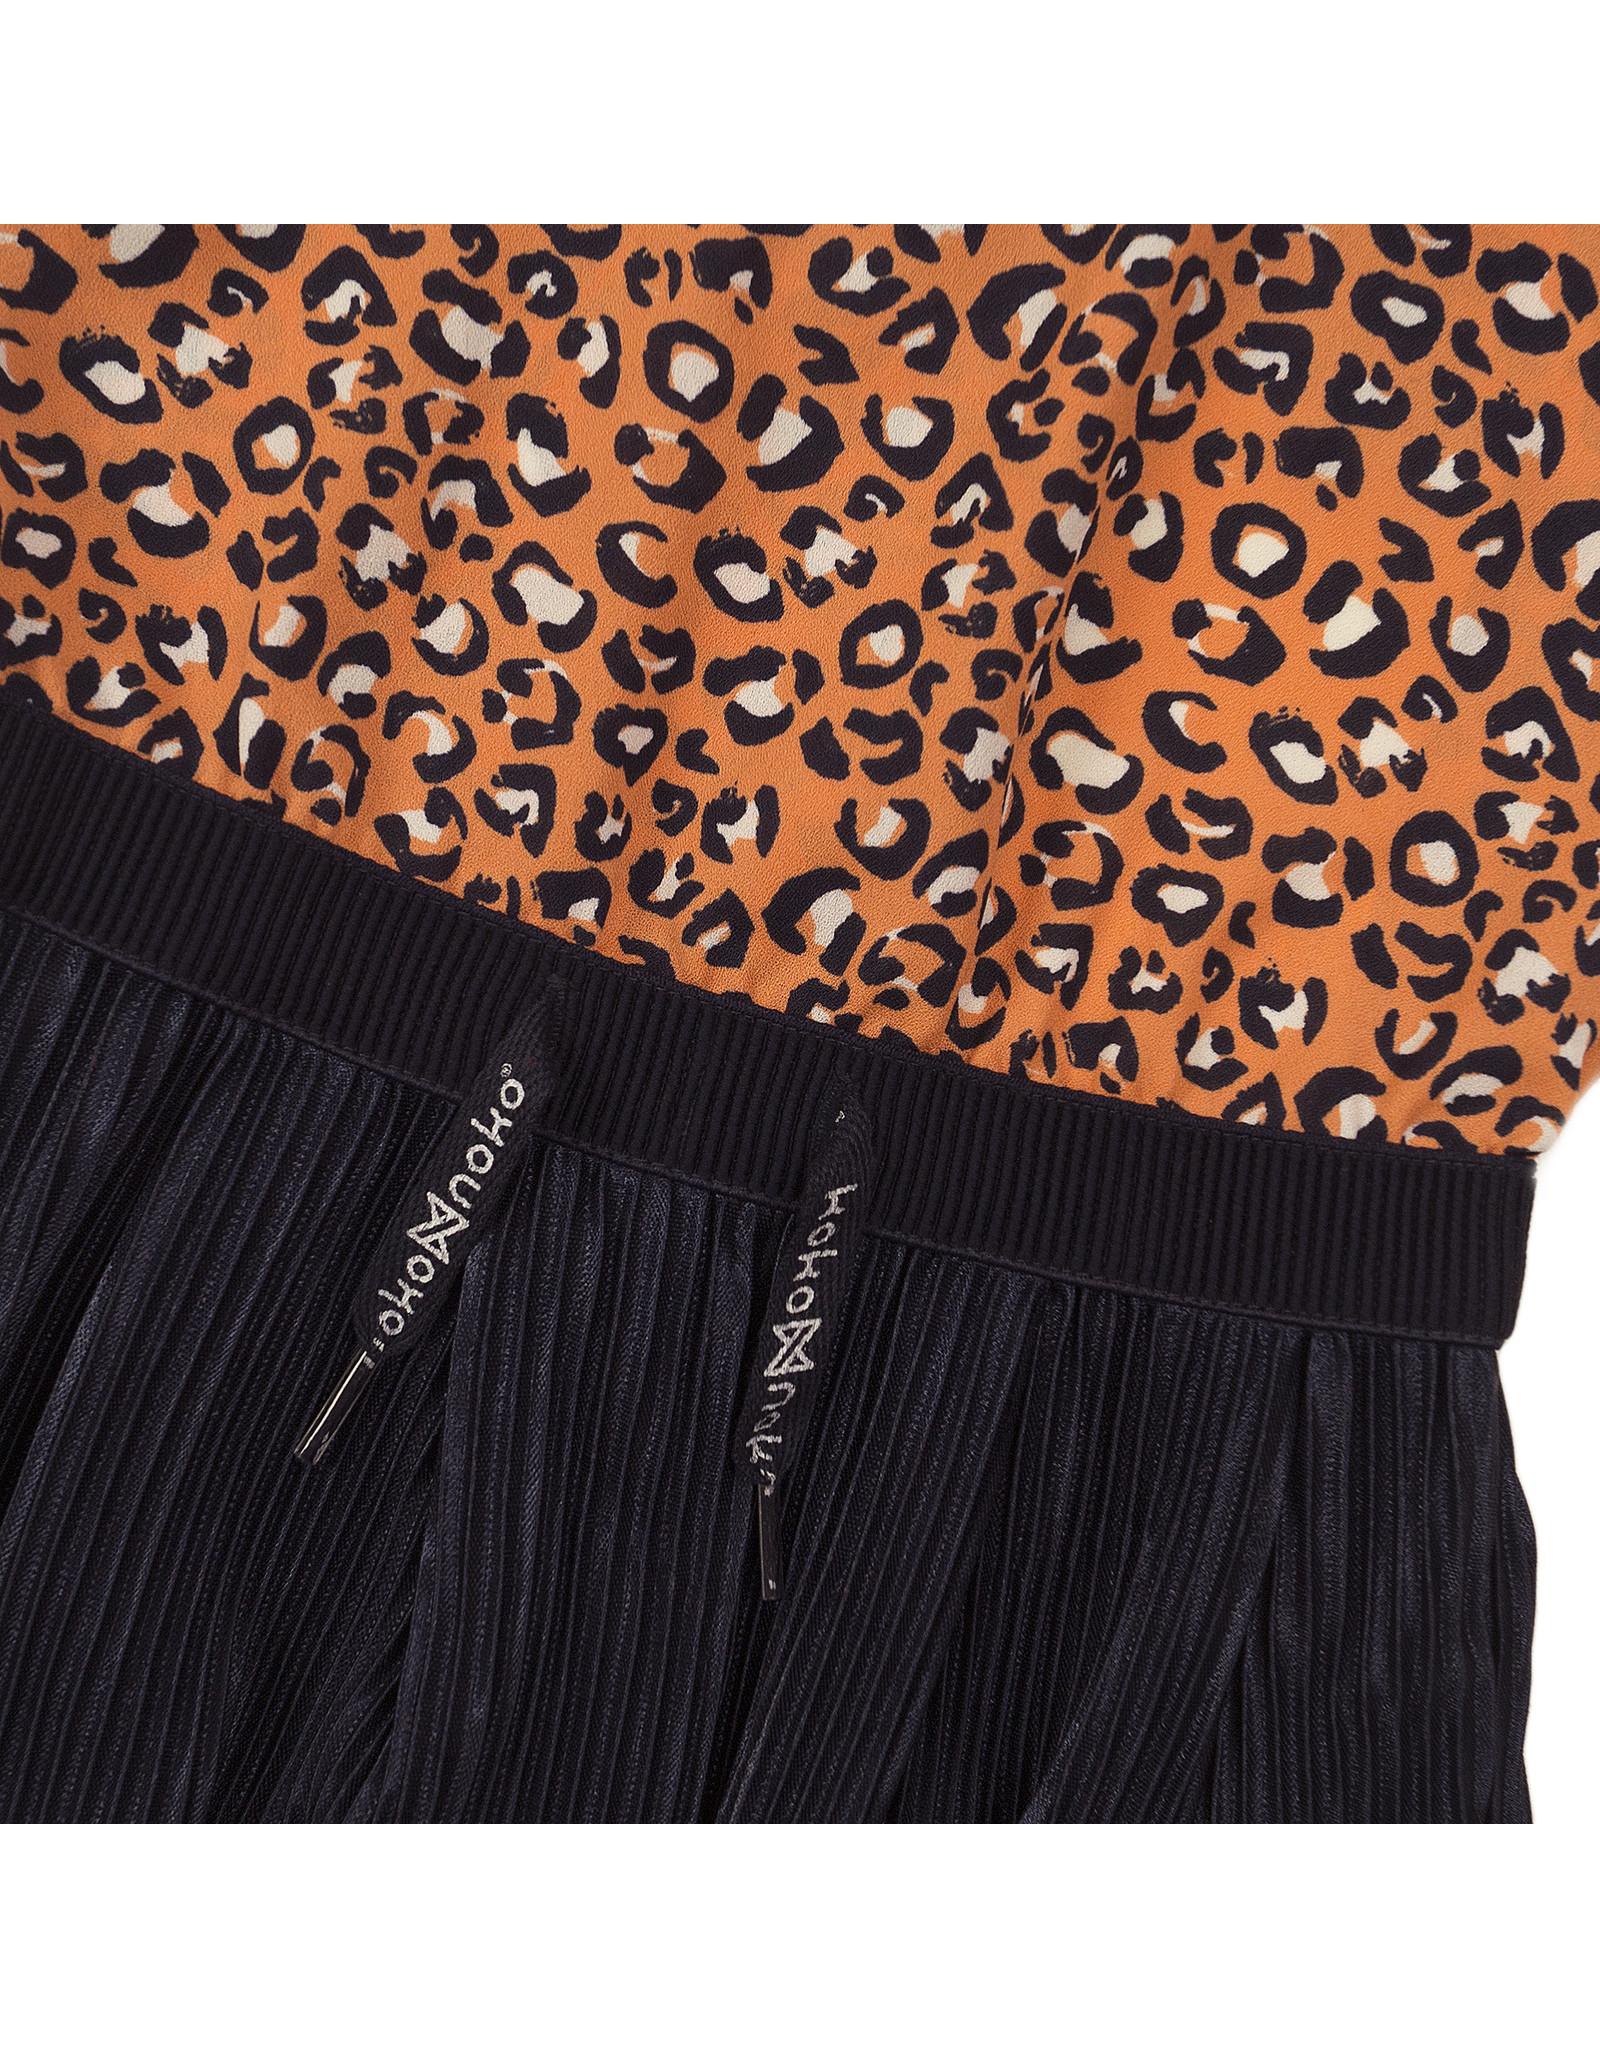 Koko Noko Girls Dress ss orange